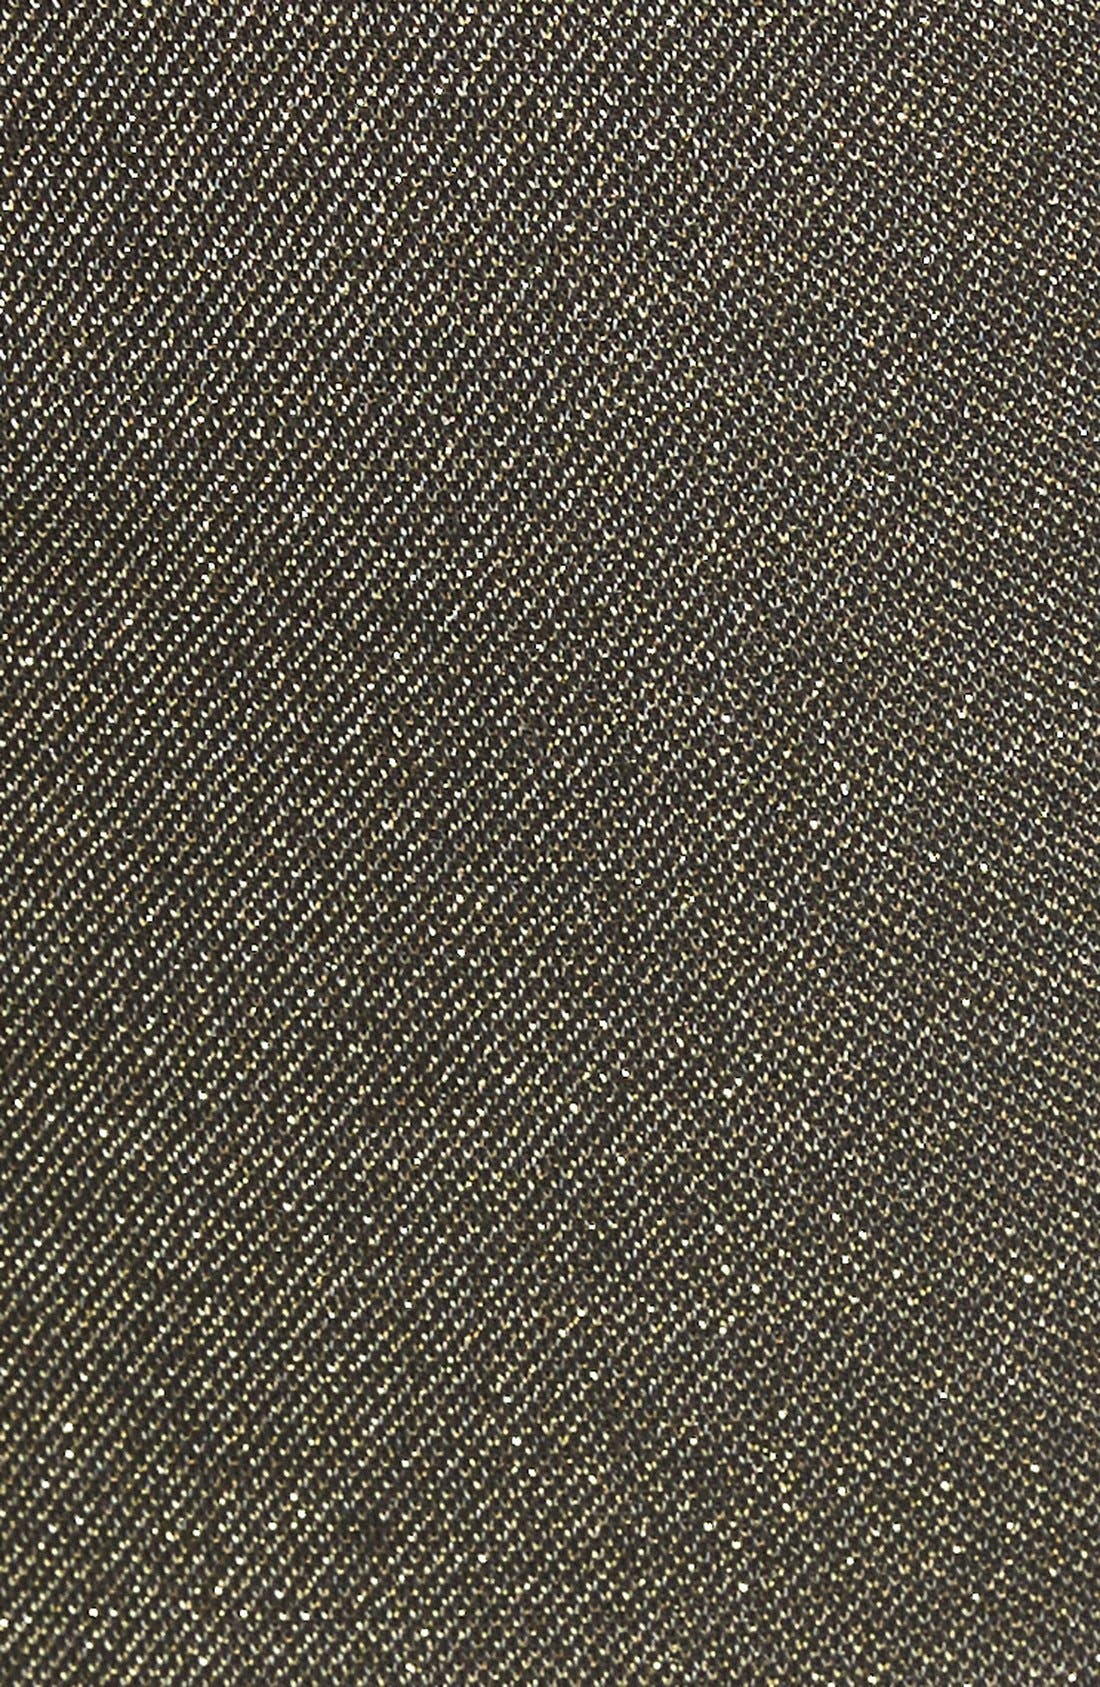 Alternate Image 3  - Volcom'CortaShorta'Crop Top